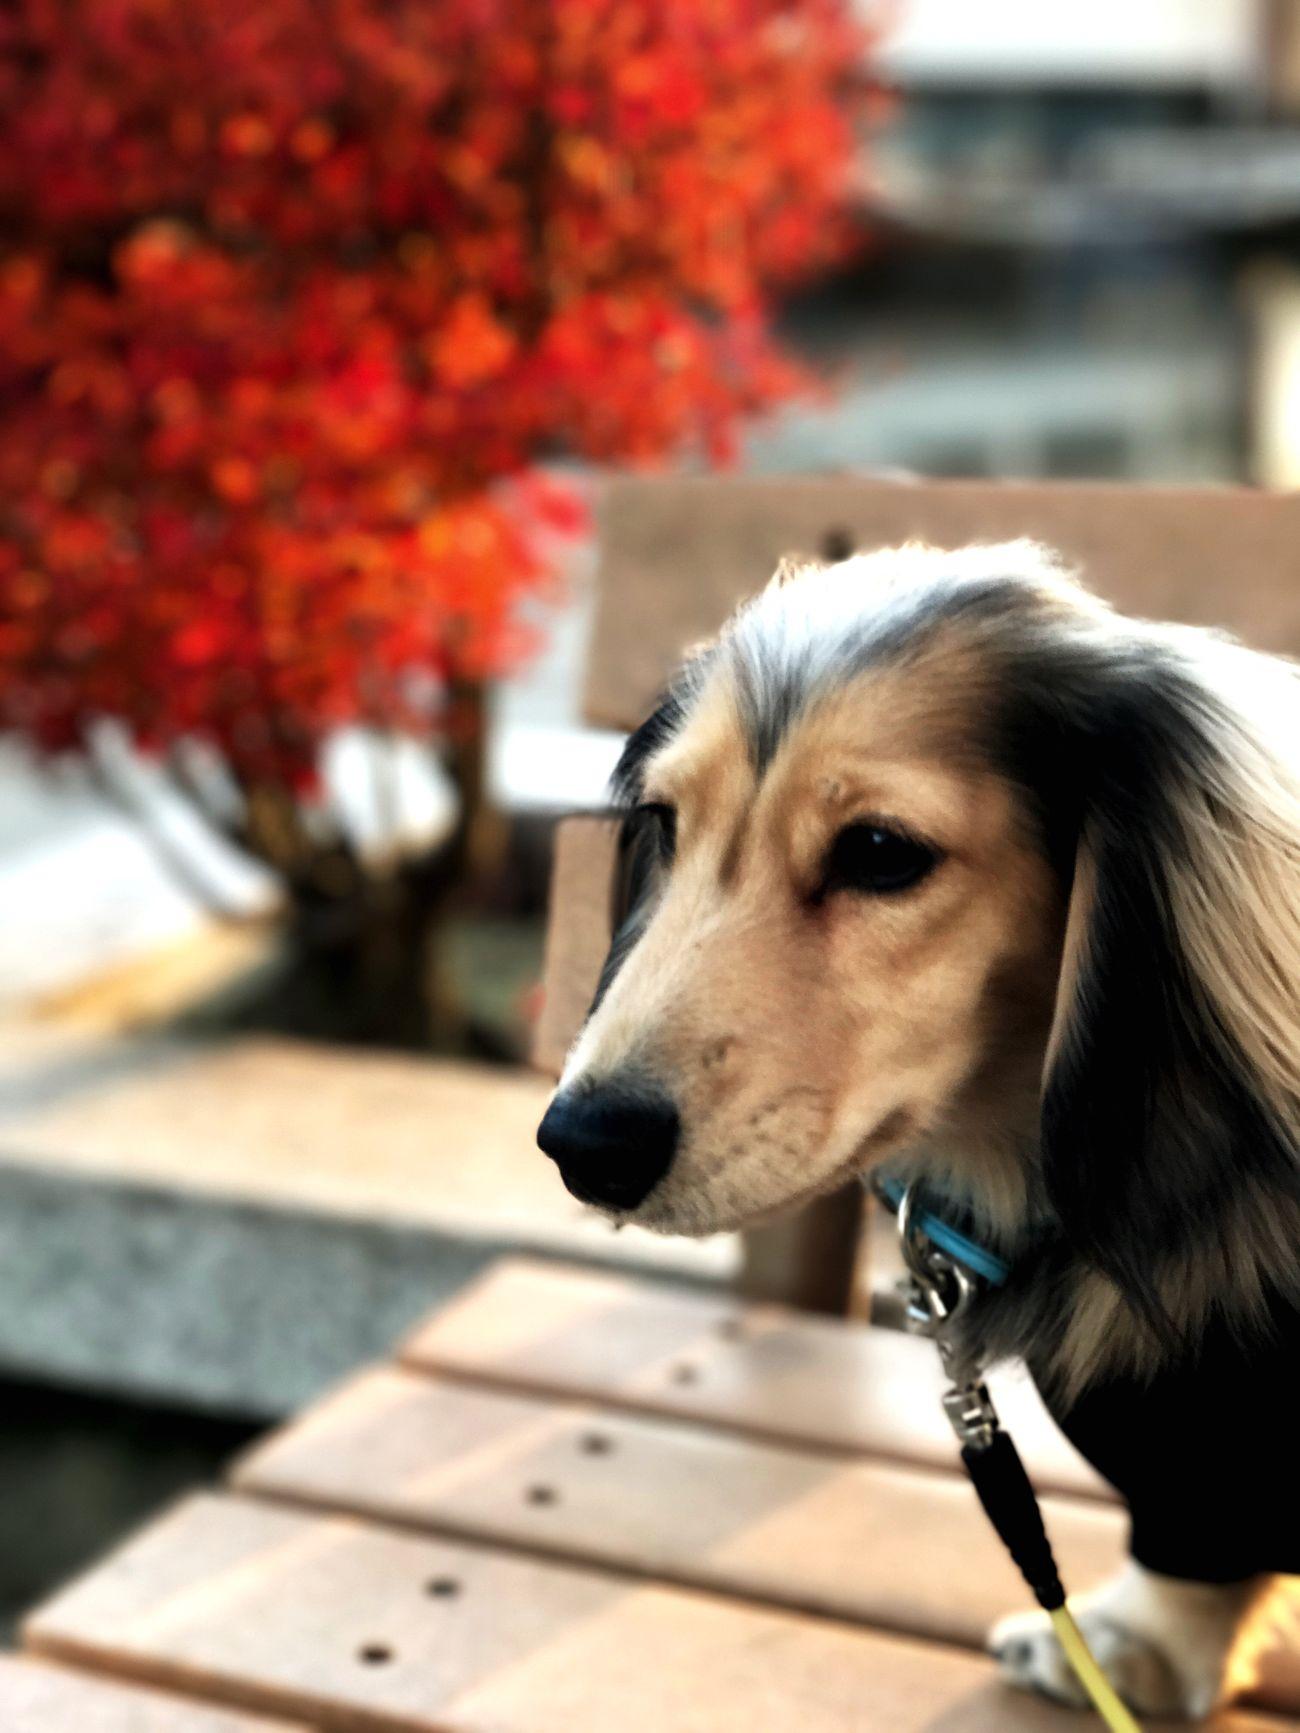 Pets Dog Close-up Outdoors IPhone7Plus Autumn